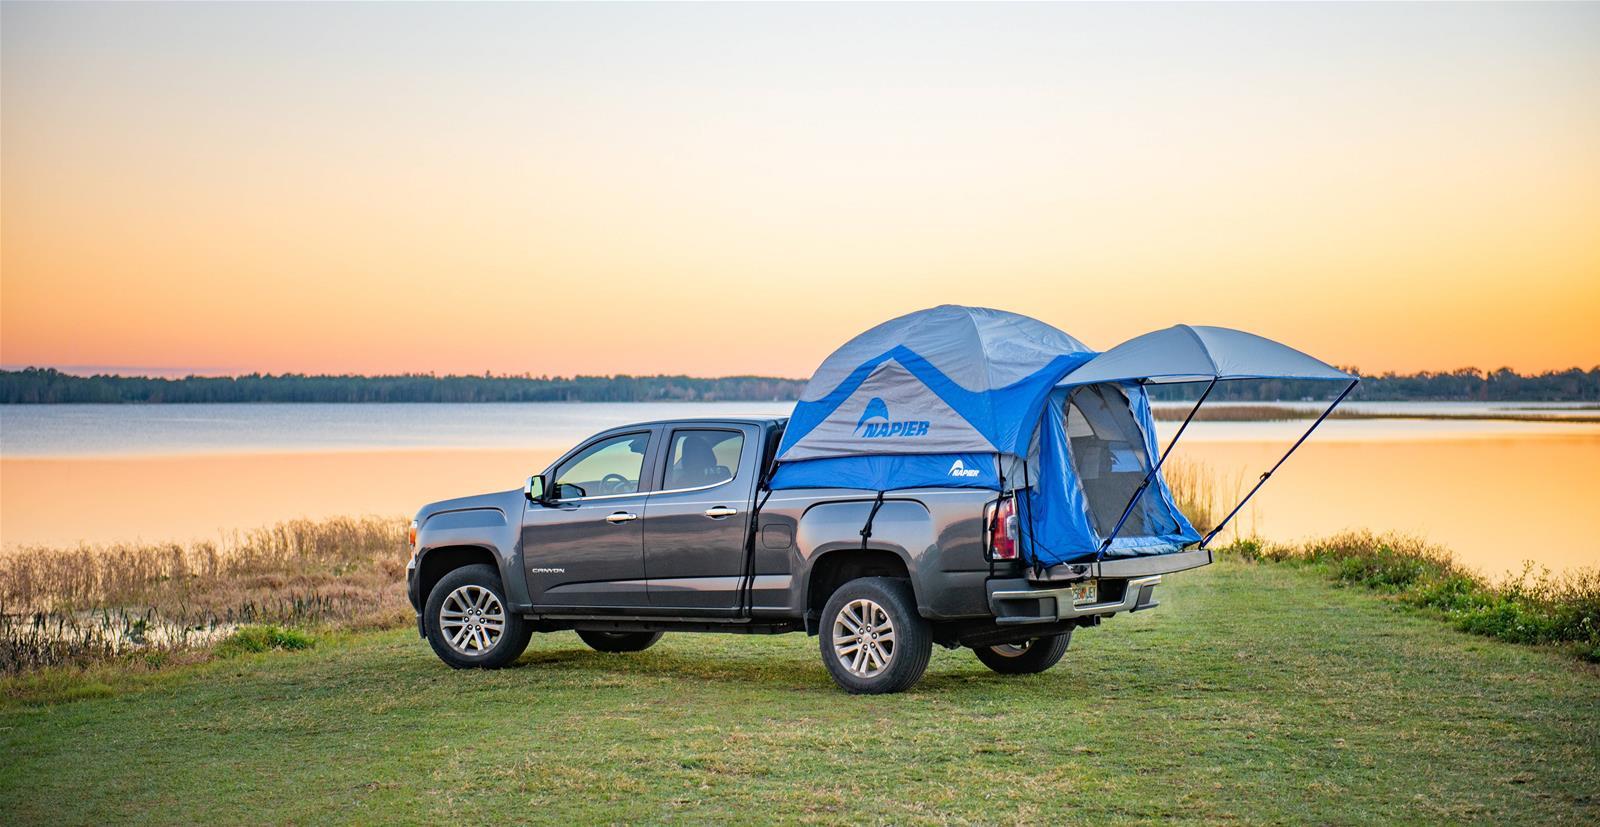 Ford F 150 Napier Sportz Truck Tents 57890